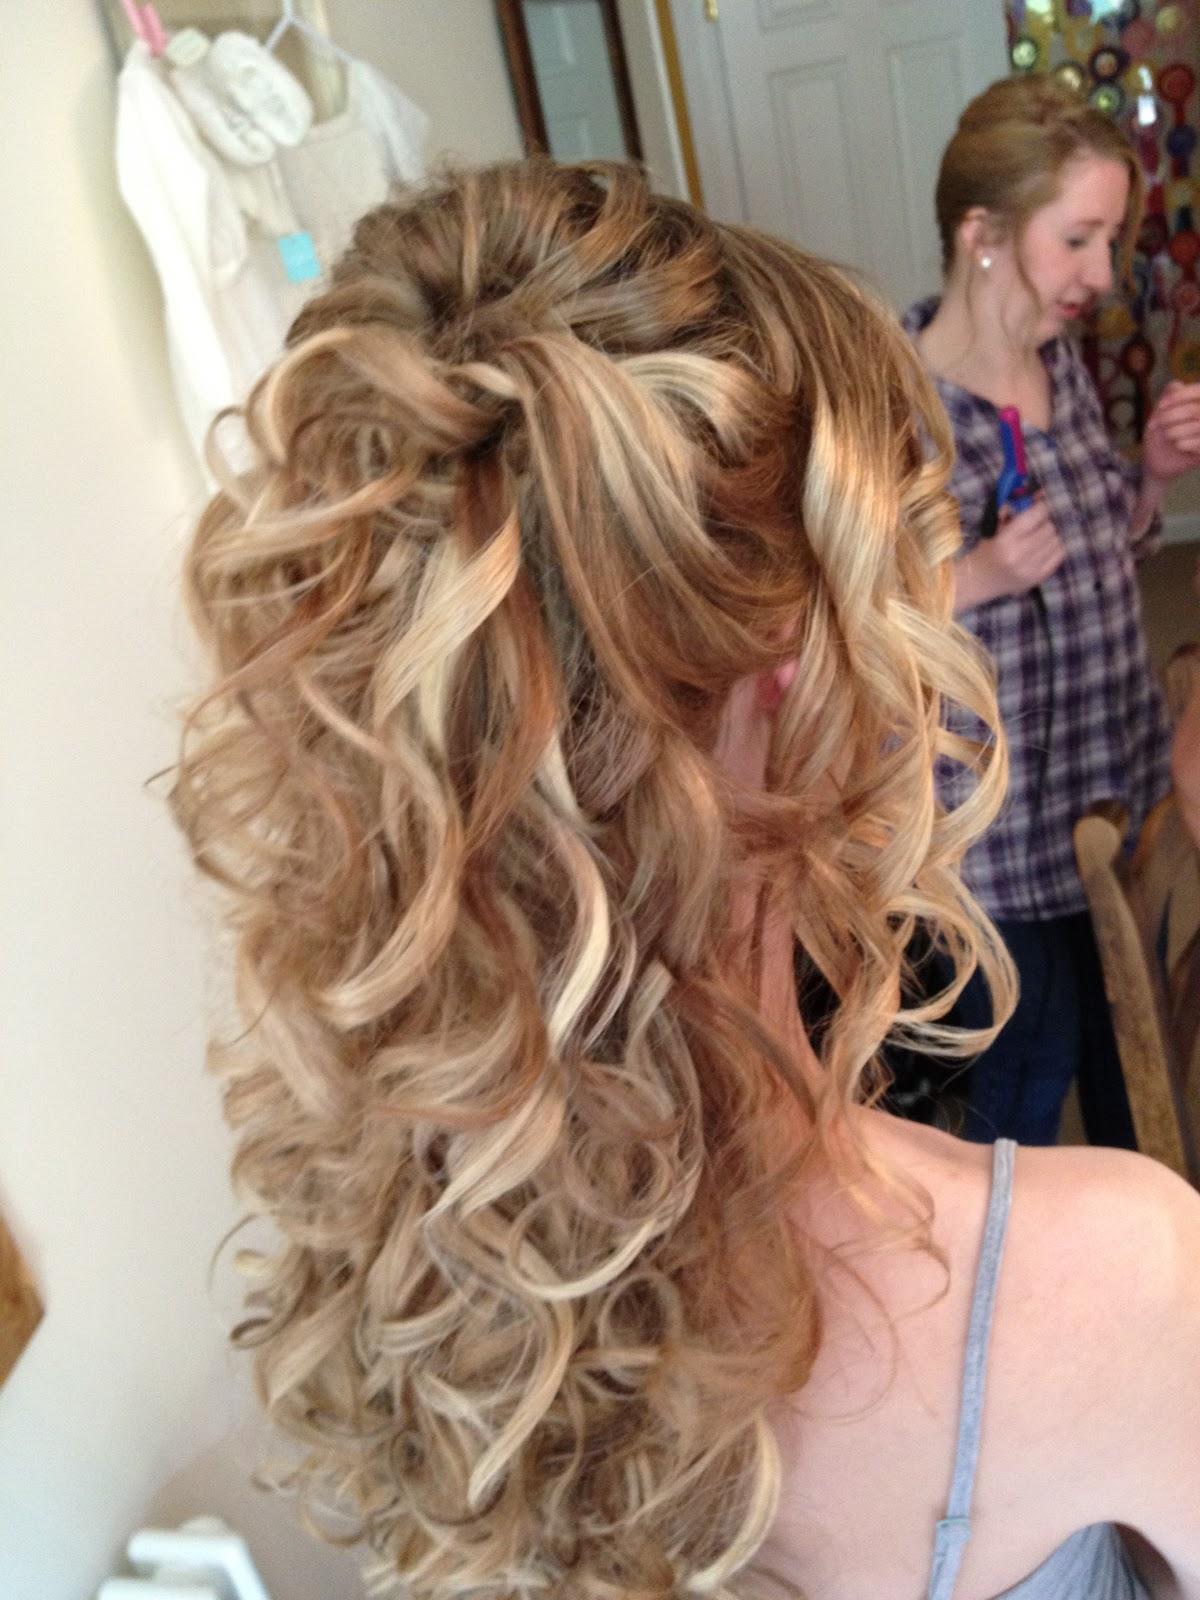 Autumn Winter Wedding Hair Styling Update